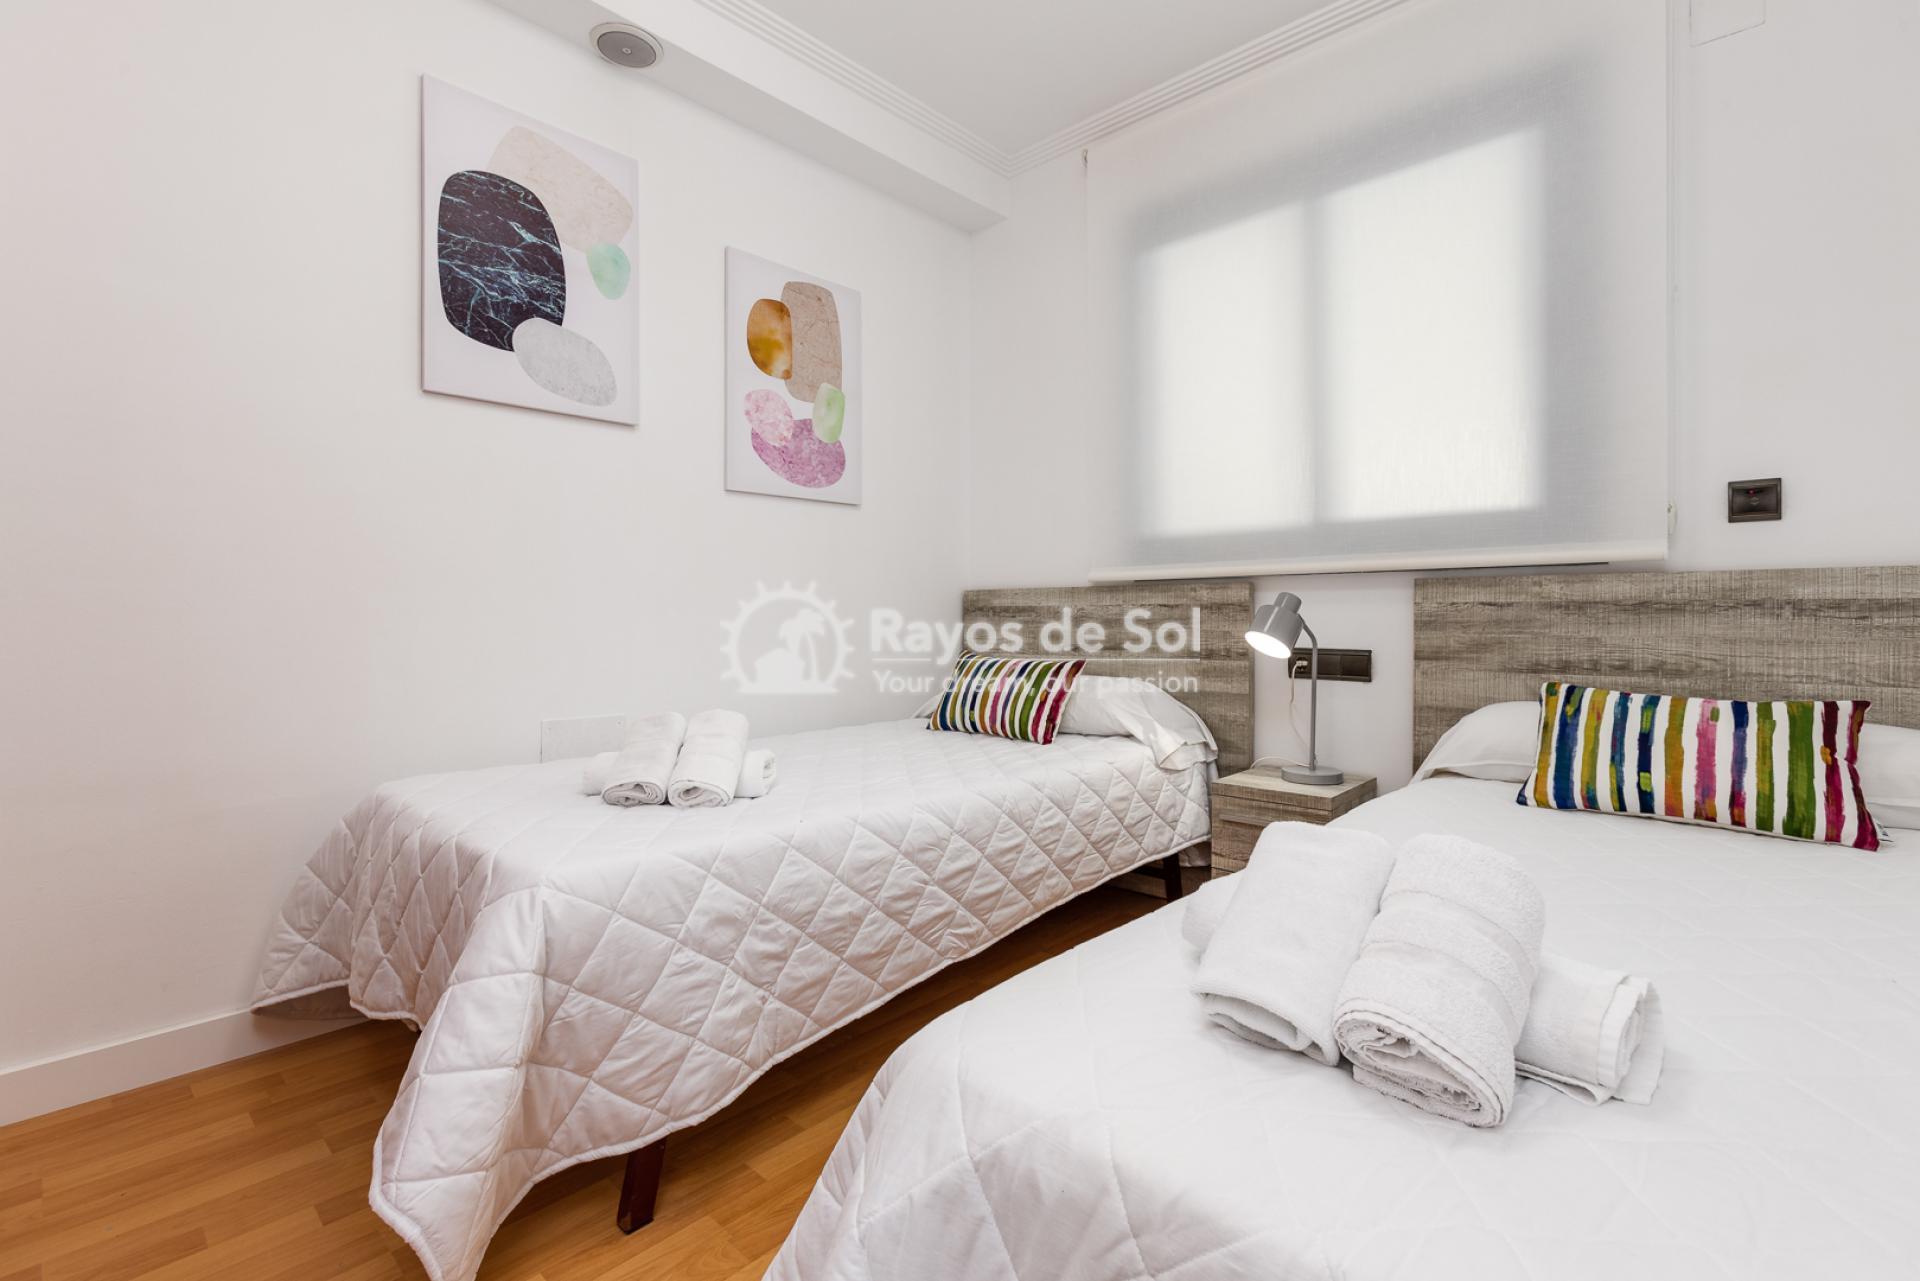 Turnekey first line apartments  in Altea, Costa Blanca (Alteabeach) - 37